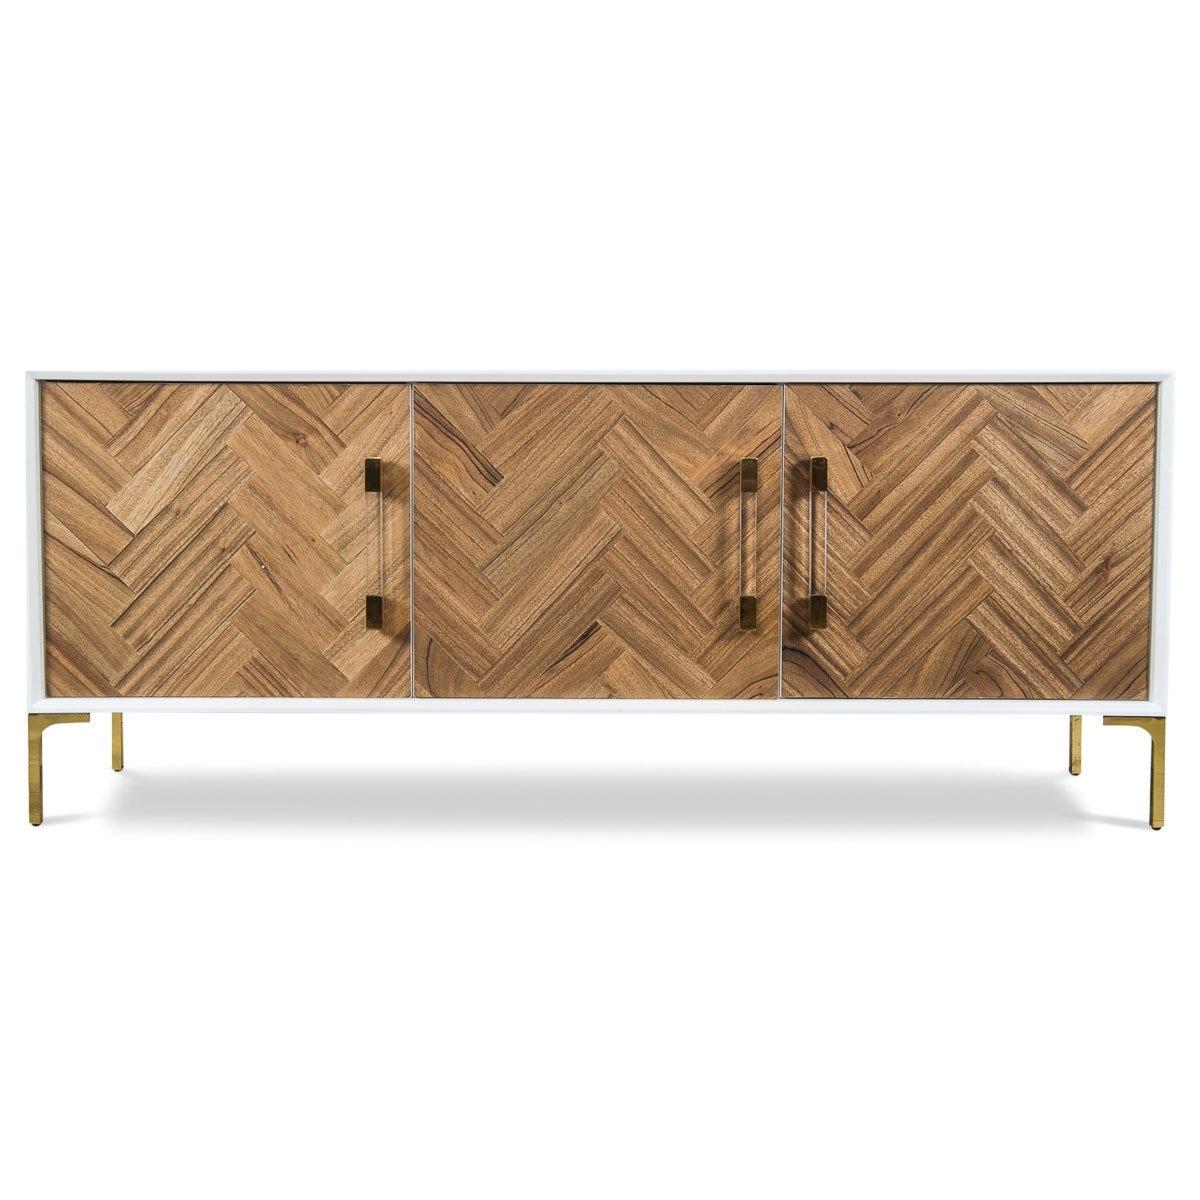 Modshop Amalfi Sideboard   Wayfair with regard to Walnut Finish 4-Door Sideboards (Image 18 of 30)